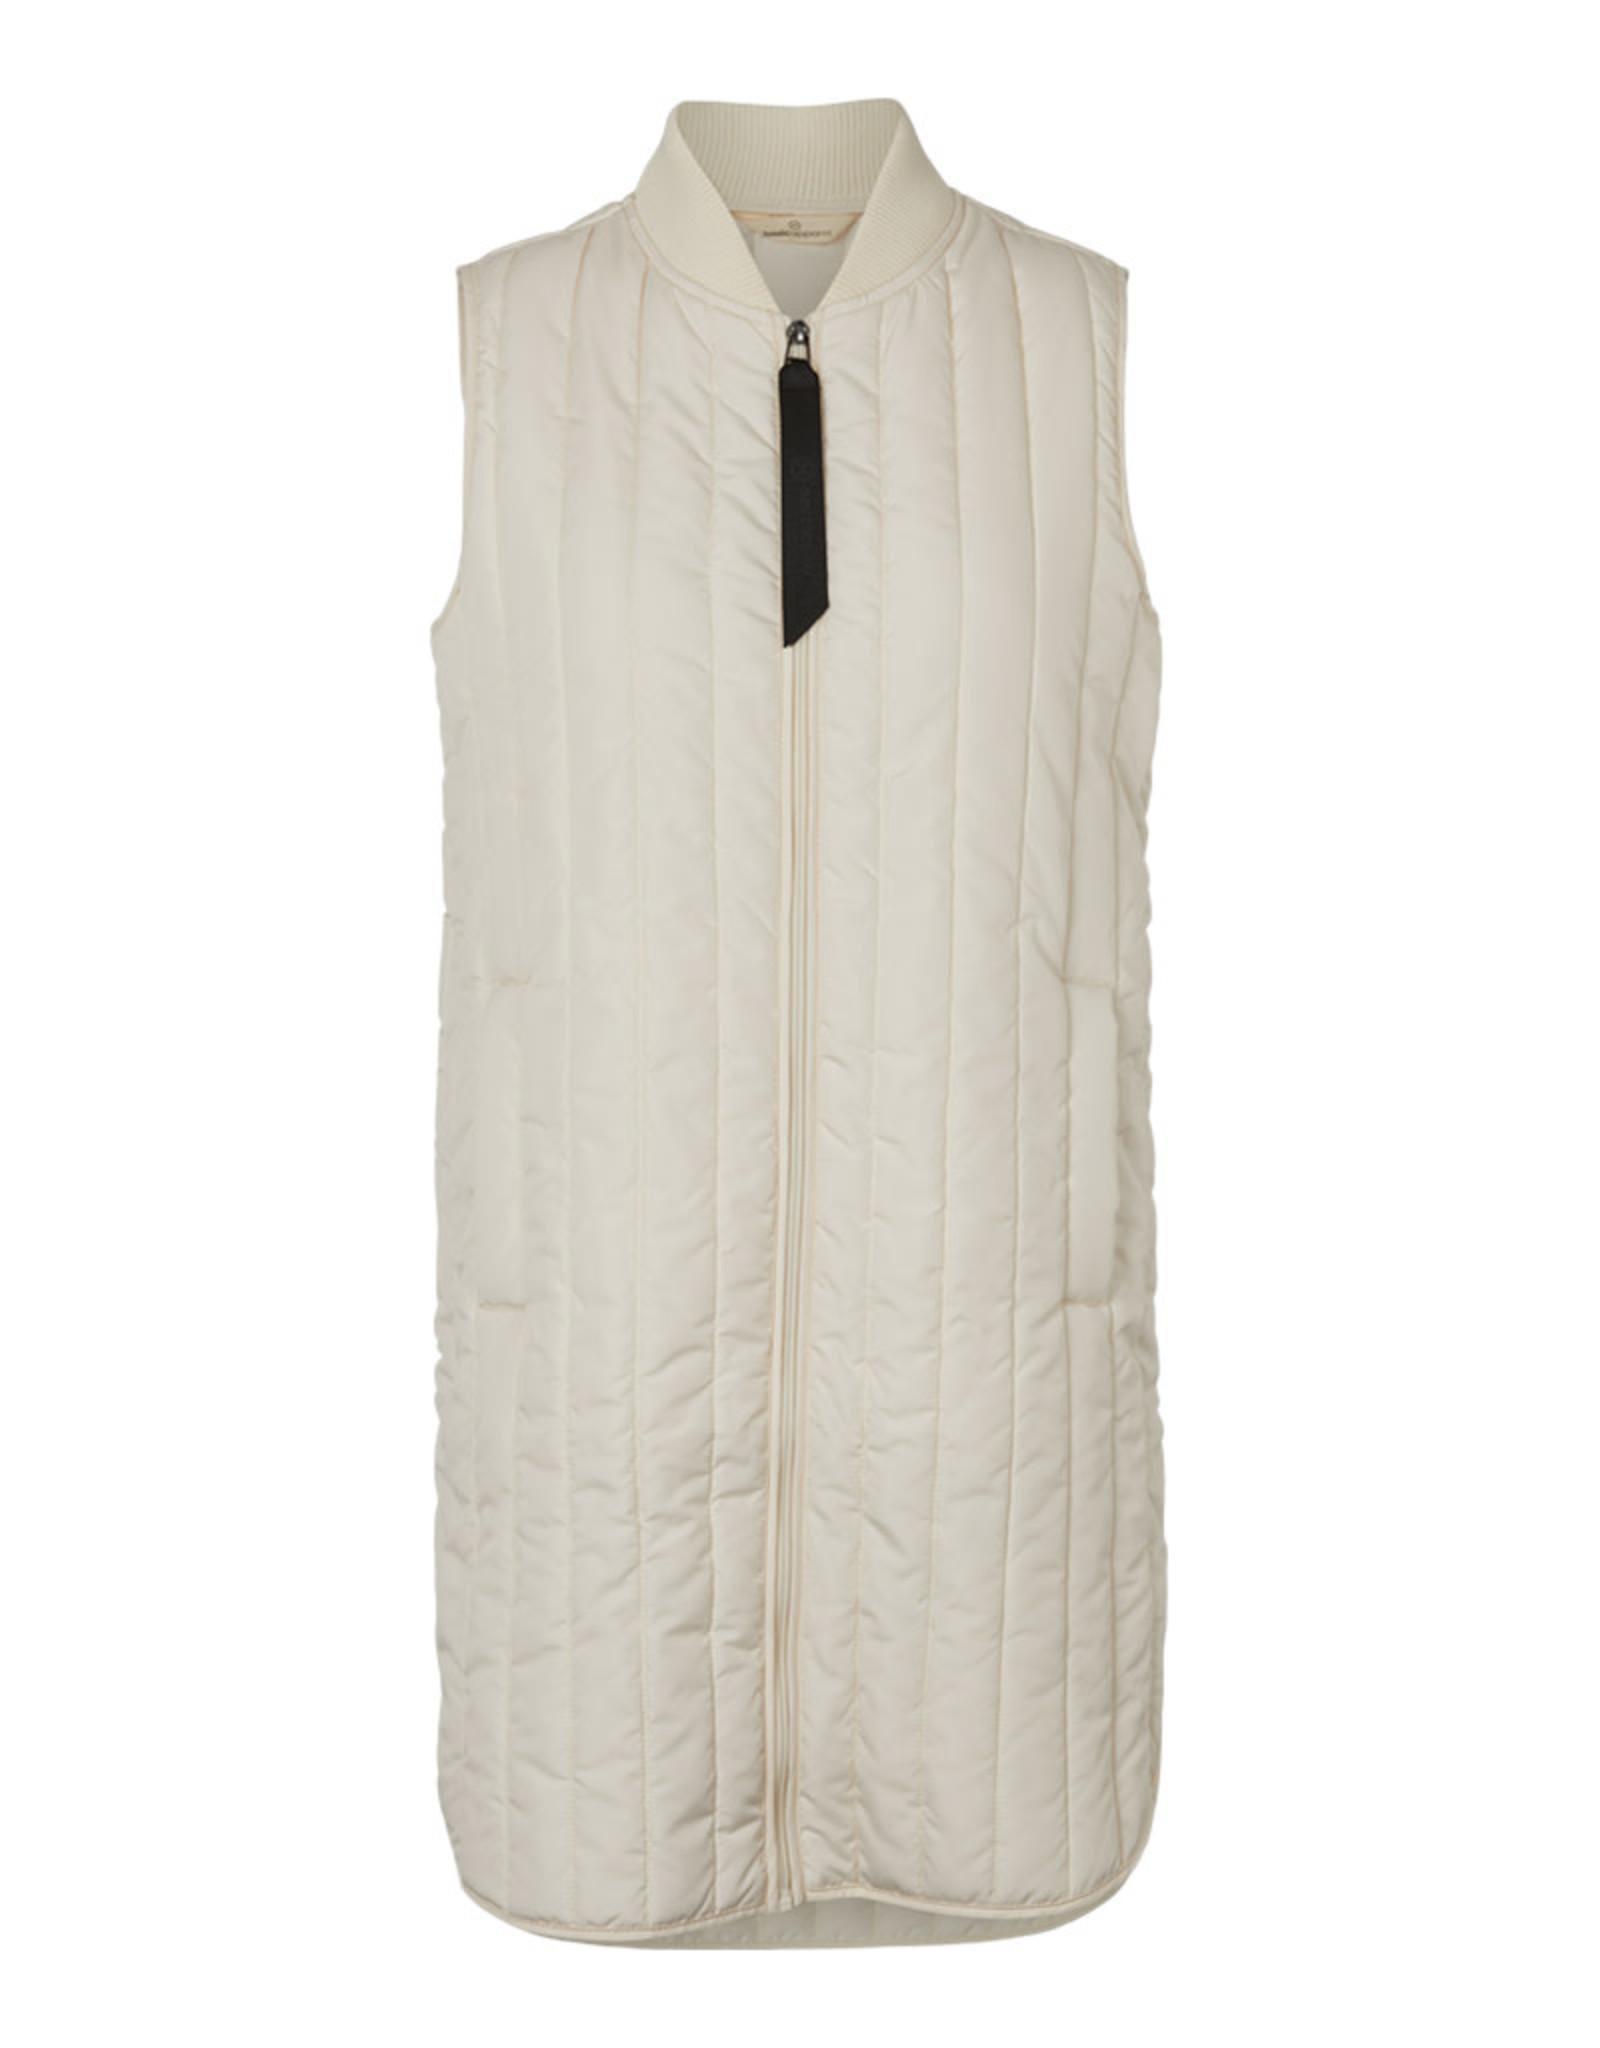 Basic Apparel Louisa Vest